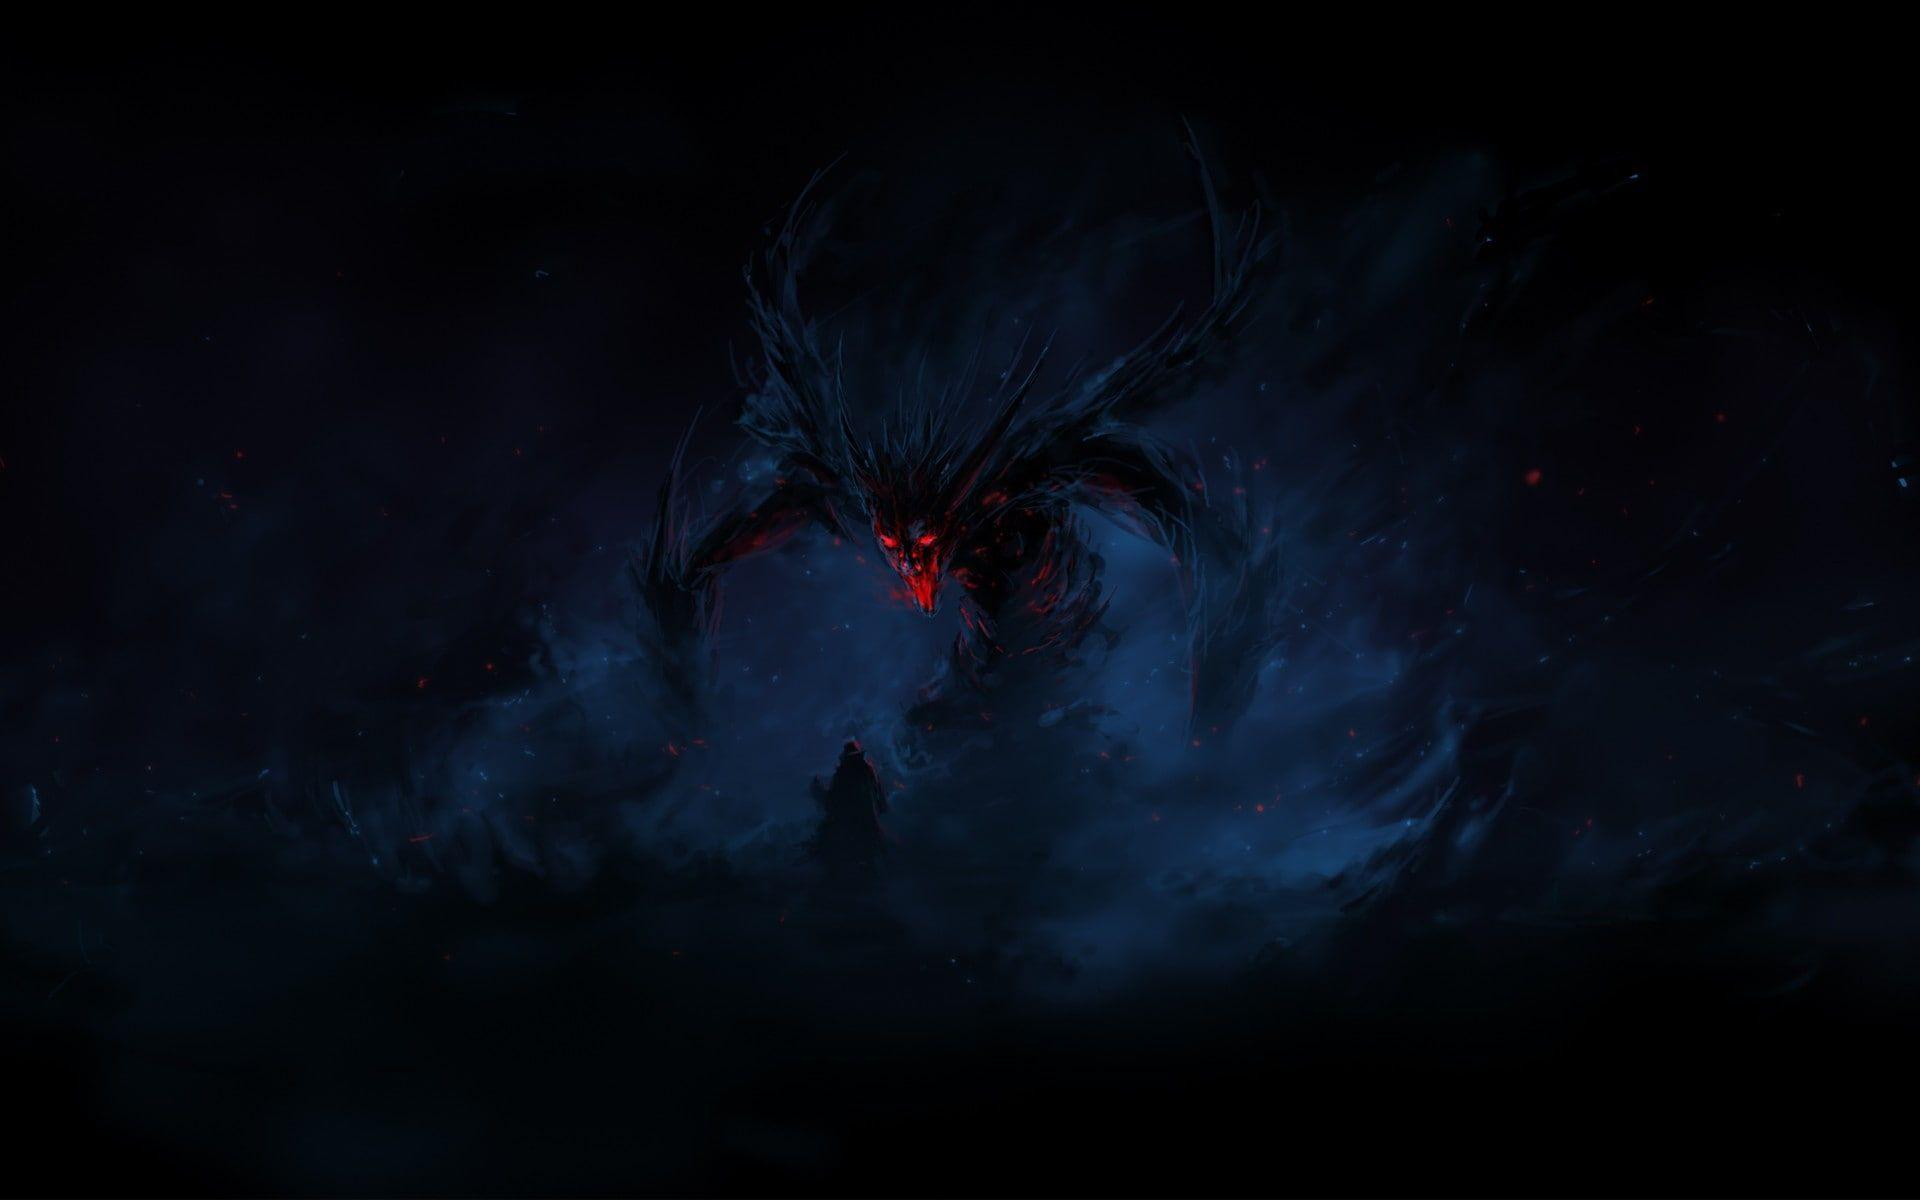 Black And Red Eagle Digital Wallpaper Artwork Fantasy Art Dragon Demon Digital Art 1080p Wallpaper Hd In 2020 Cartoon Wallpaper Hd Scary Dreams Digital Wallpaper